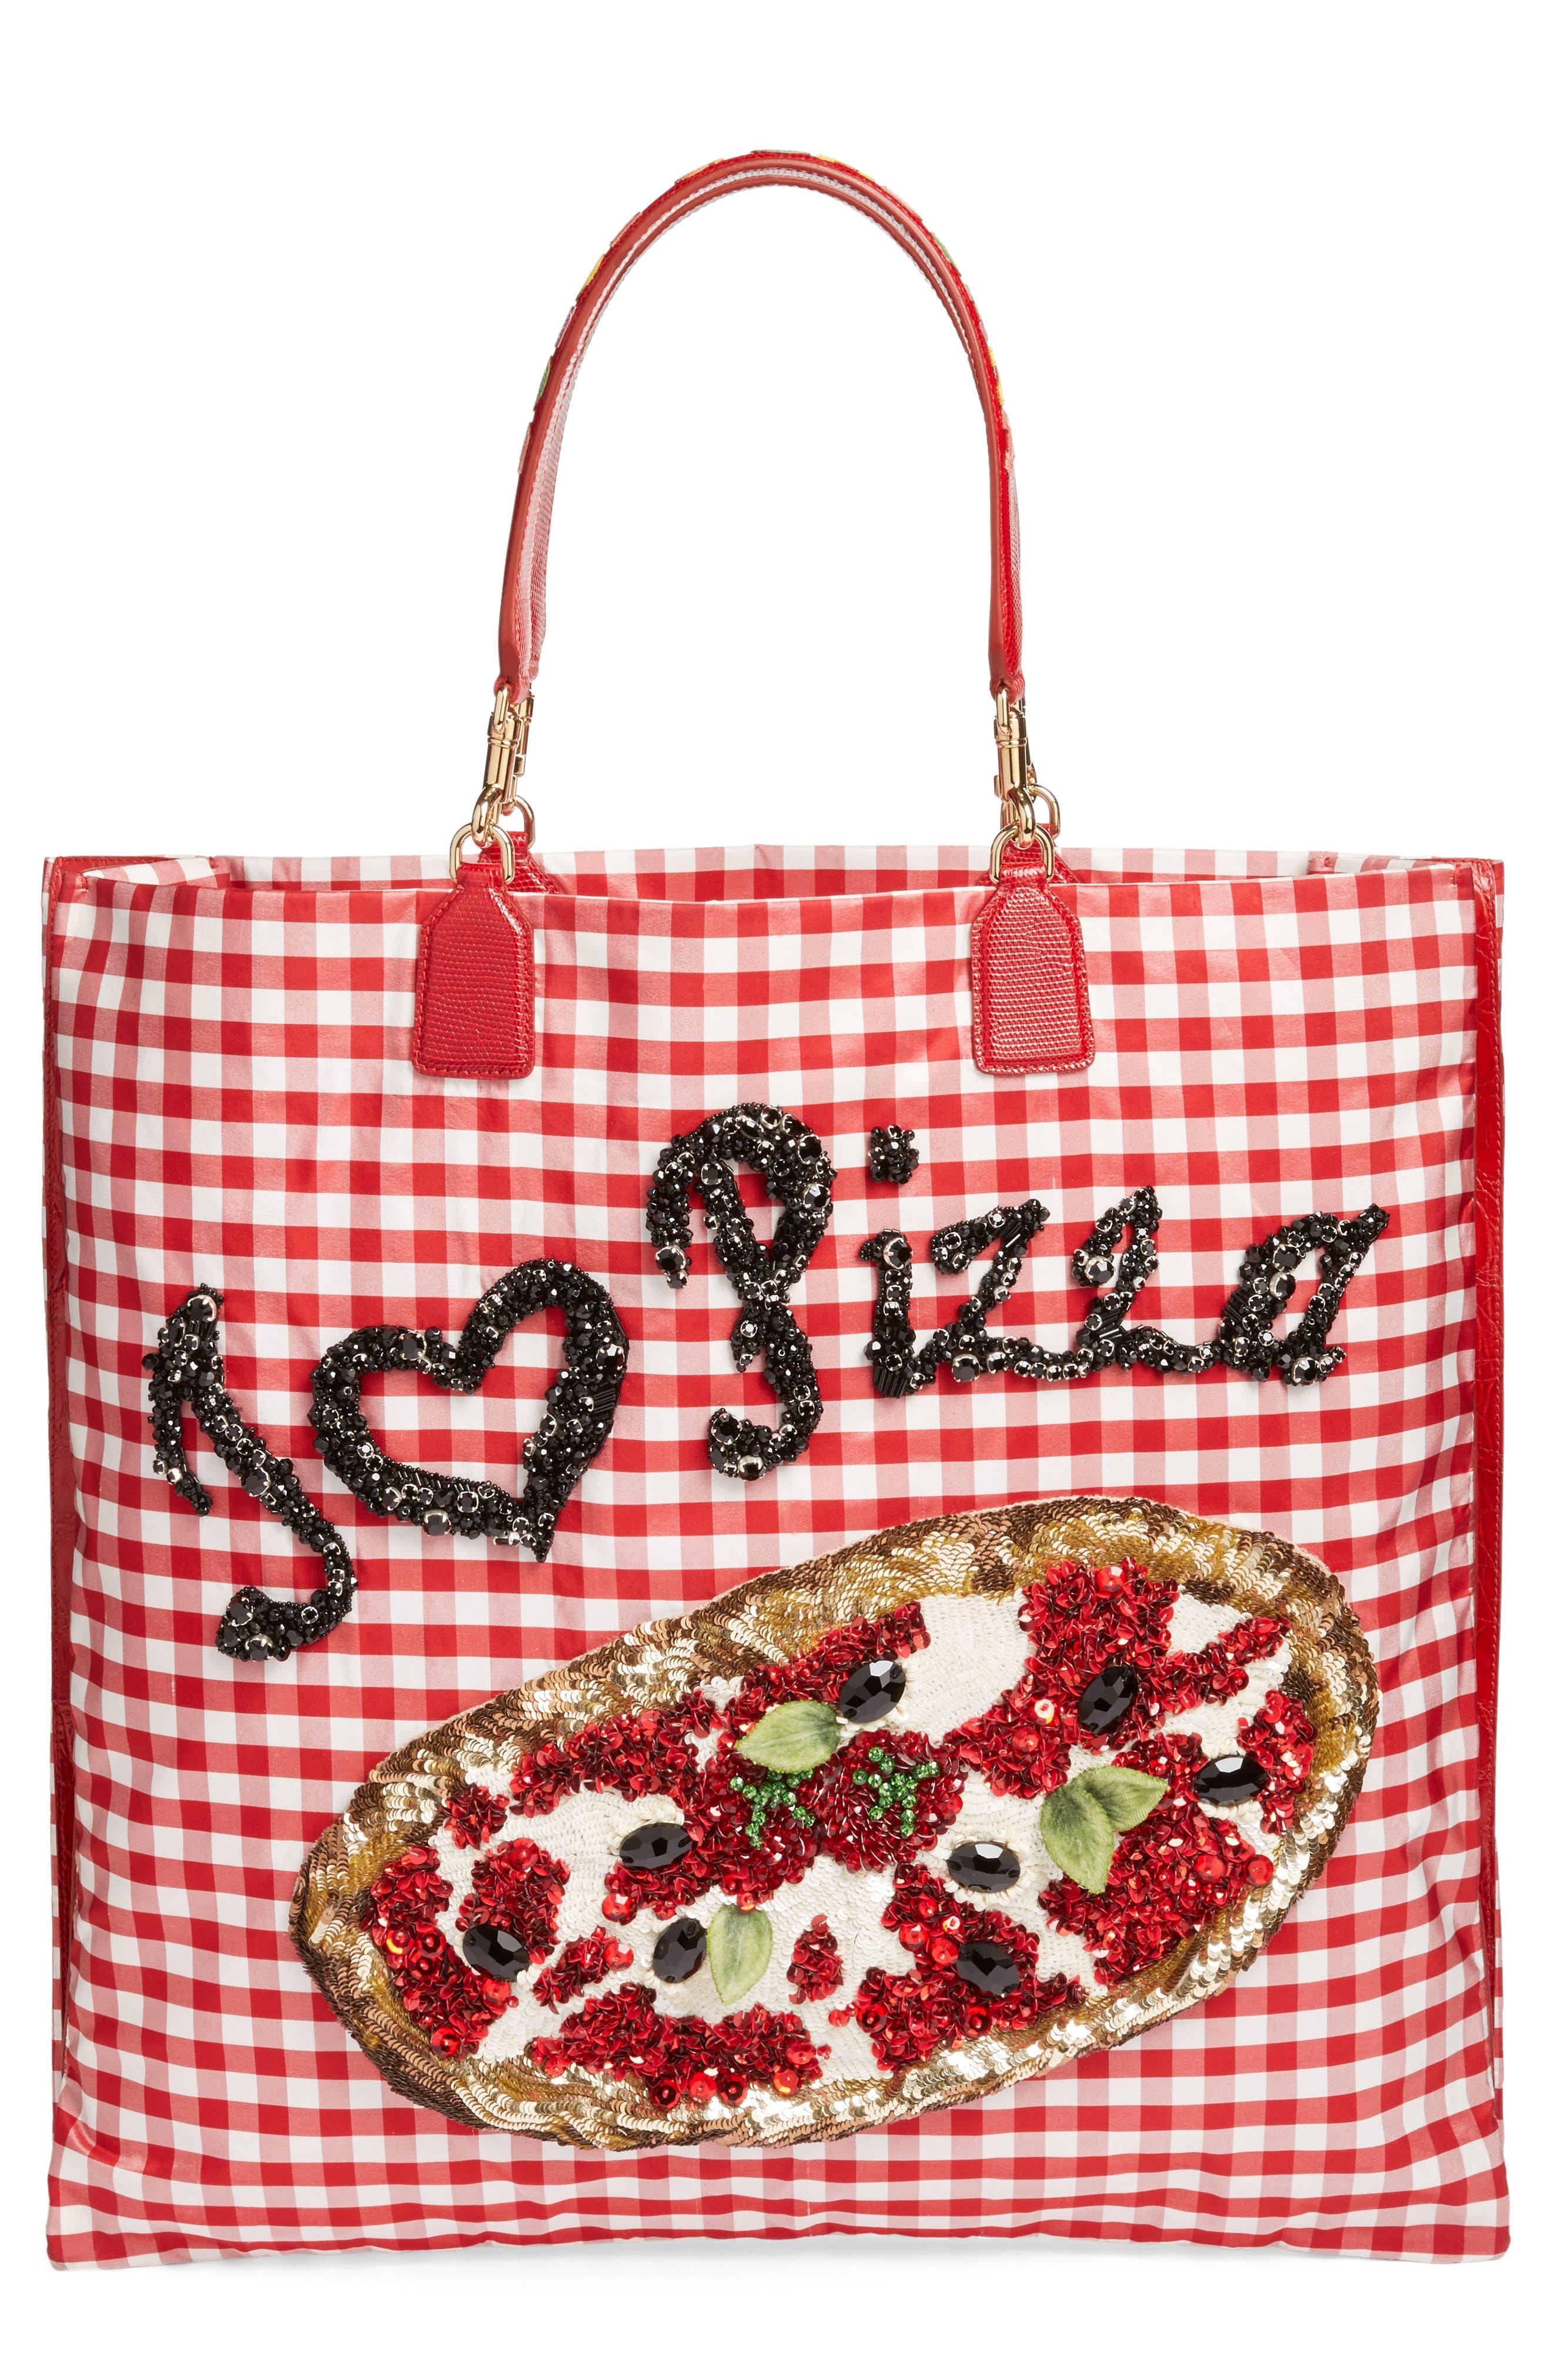 DOLCE&GABBANA, I Love Pizza Tote, Main thumbnail 1, color, 640